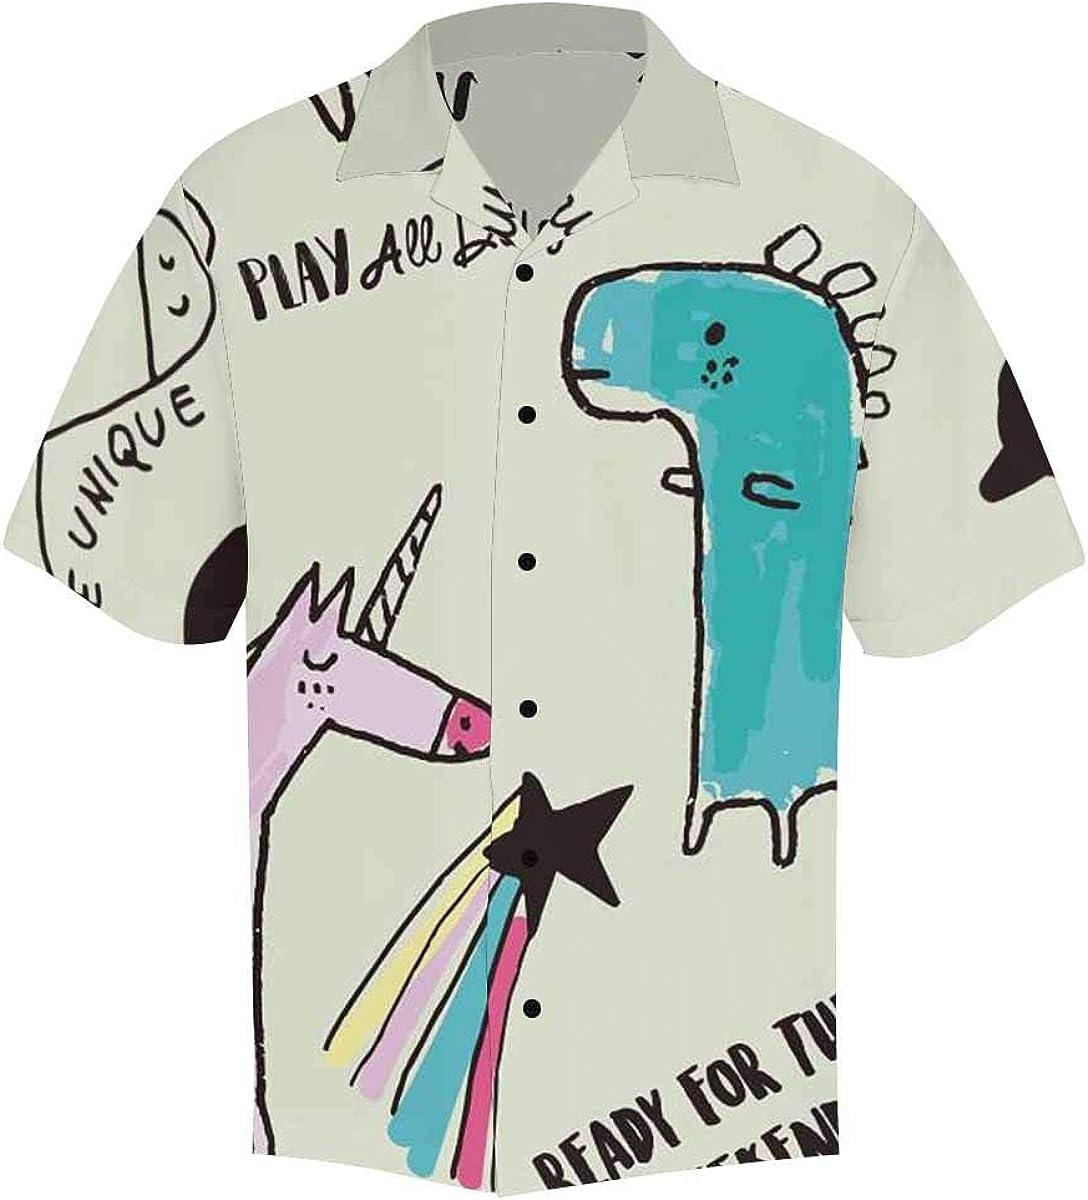 InterestPrint Men's Short Sleeve Hawaiian Shirts with Black Button V-Neck Unicorn Dino and Star